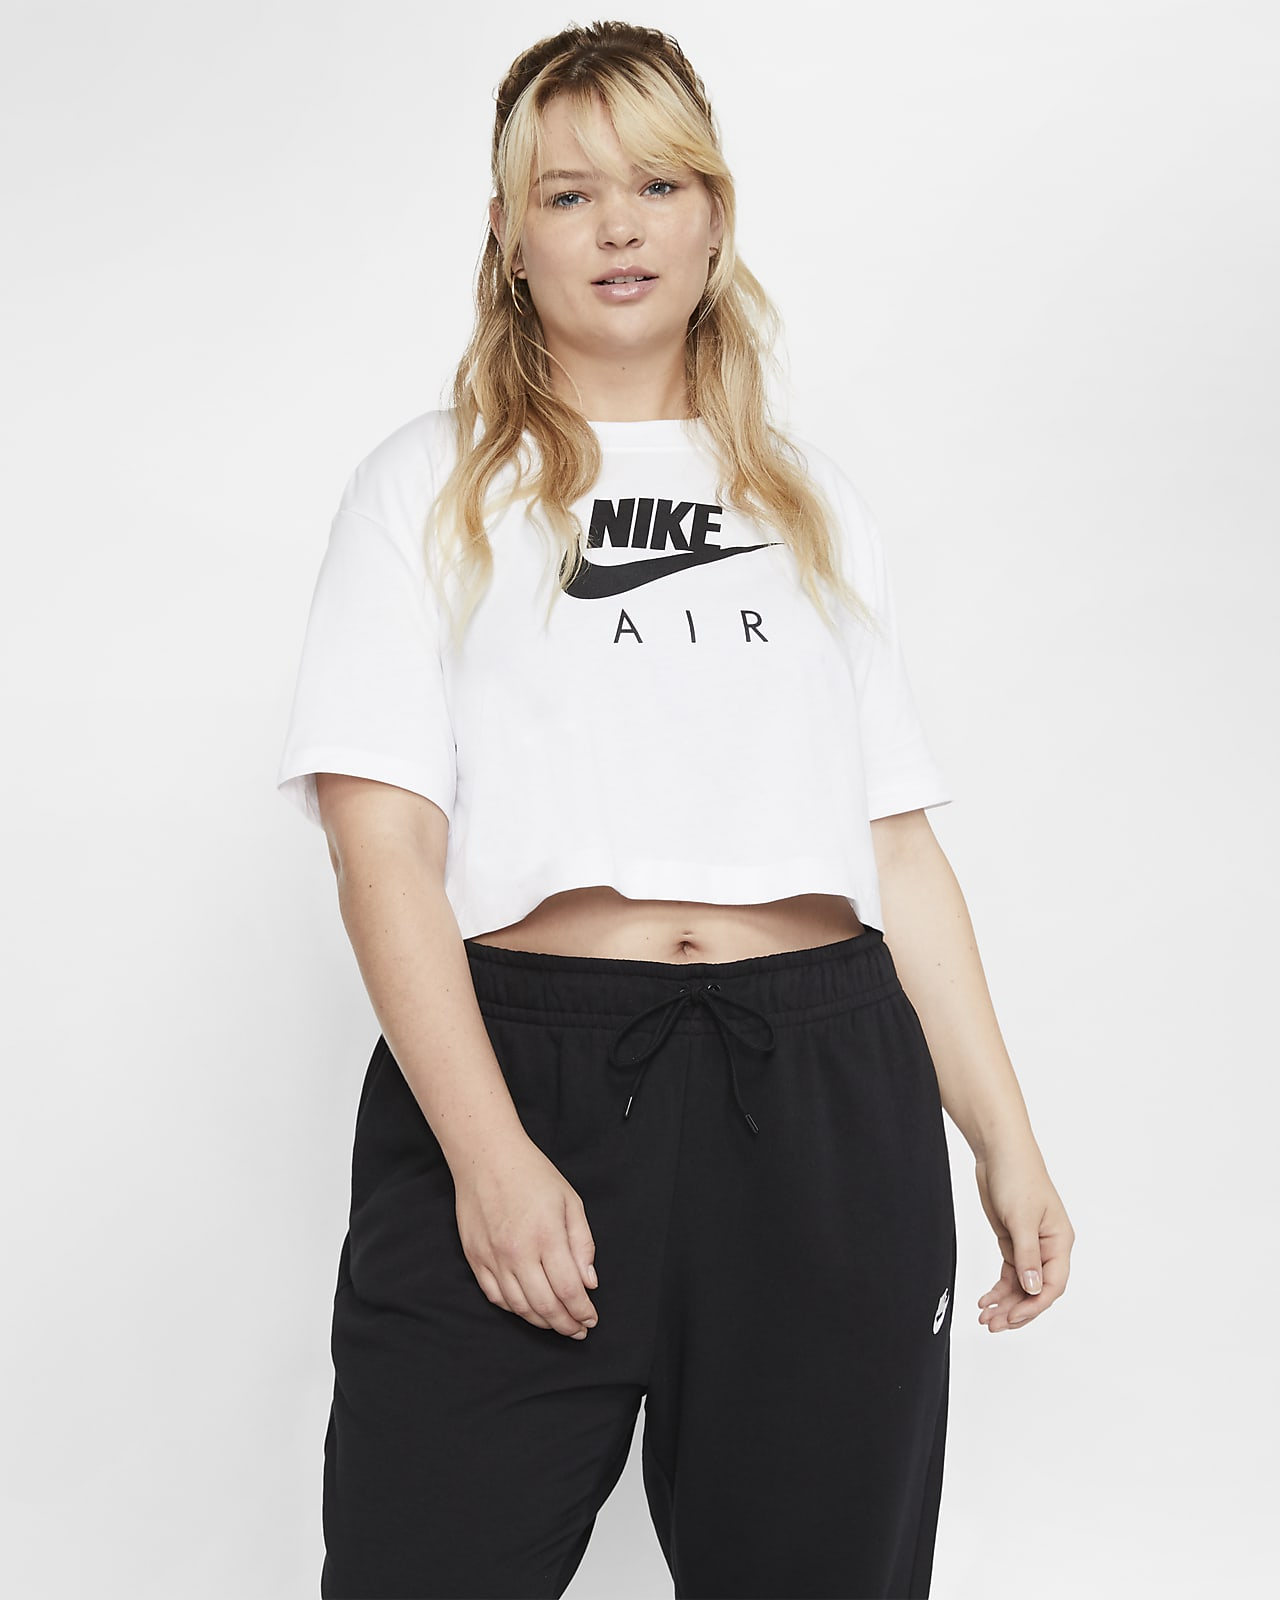 Nike Air Women's Short-Sleeve Top (Plus